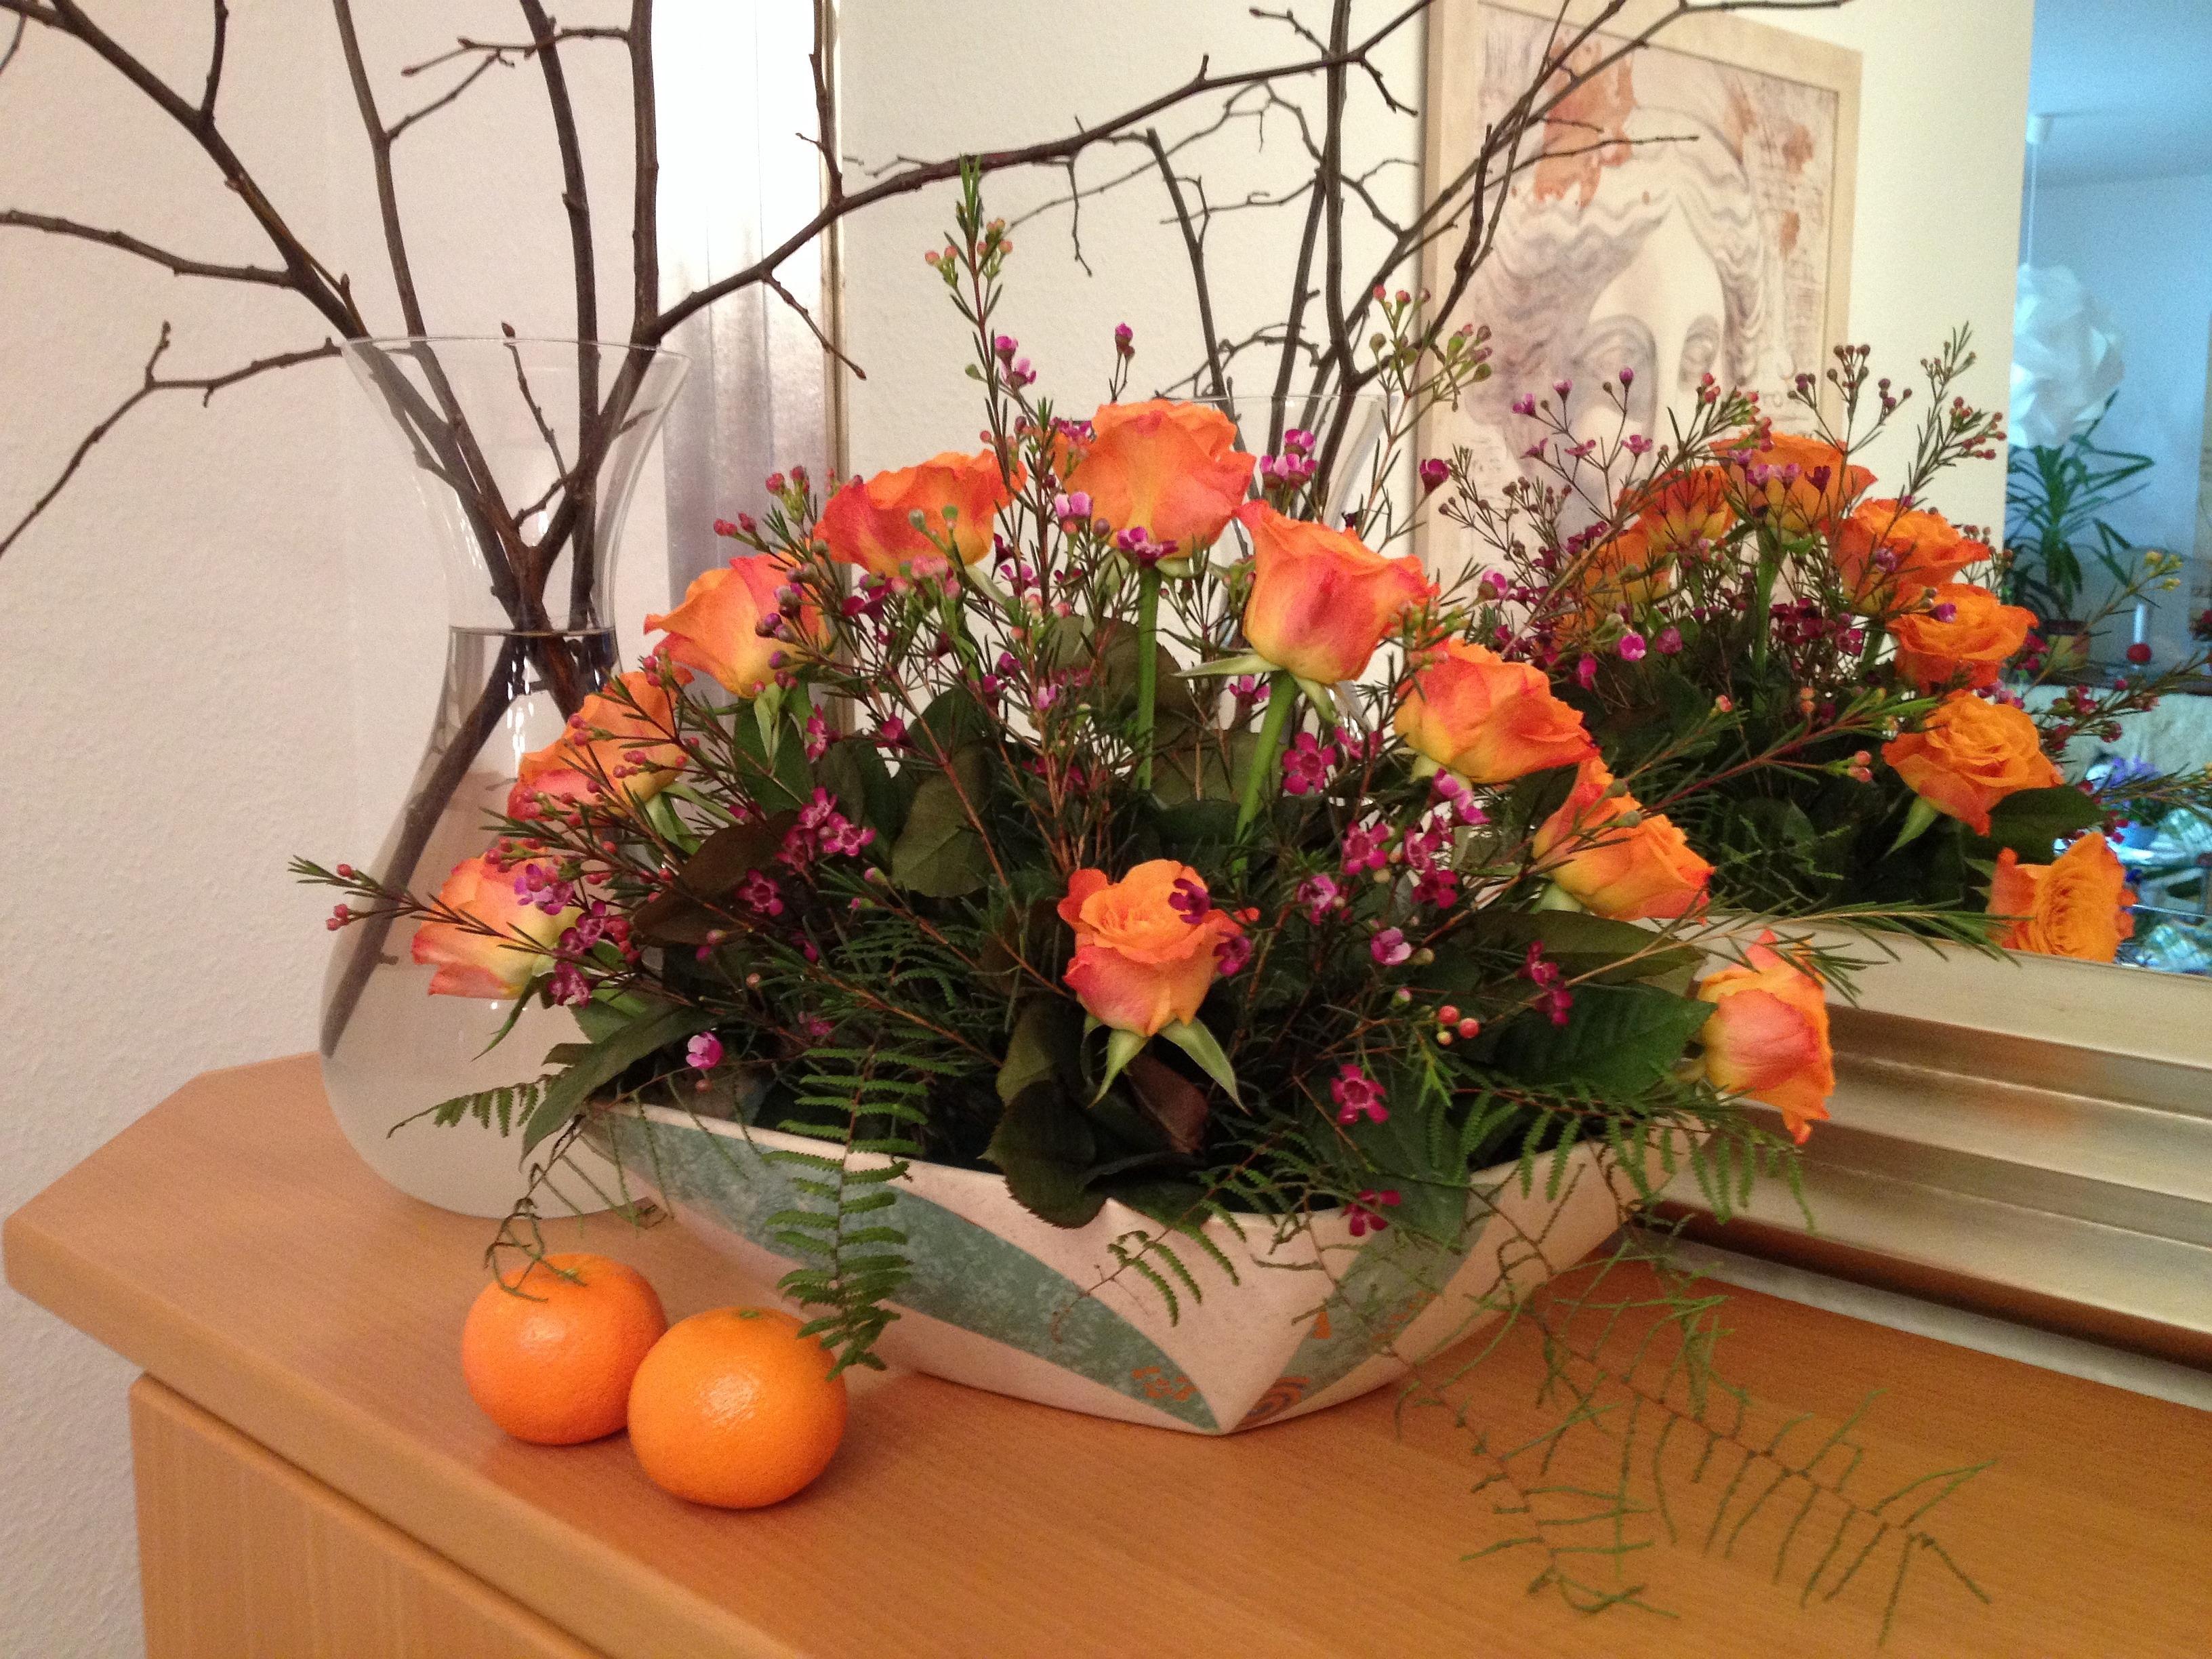 Fotos Gratis Planta Flor Decoración Naranja Flora